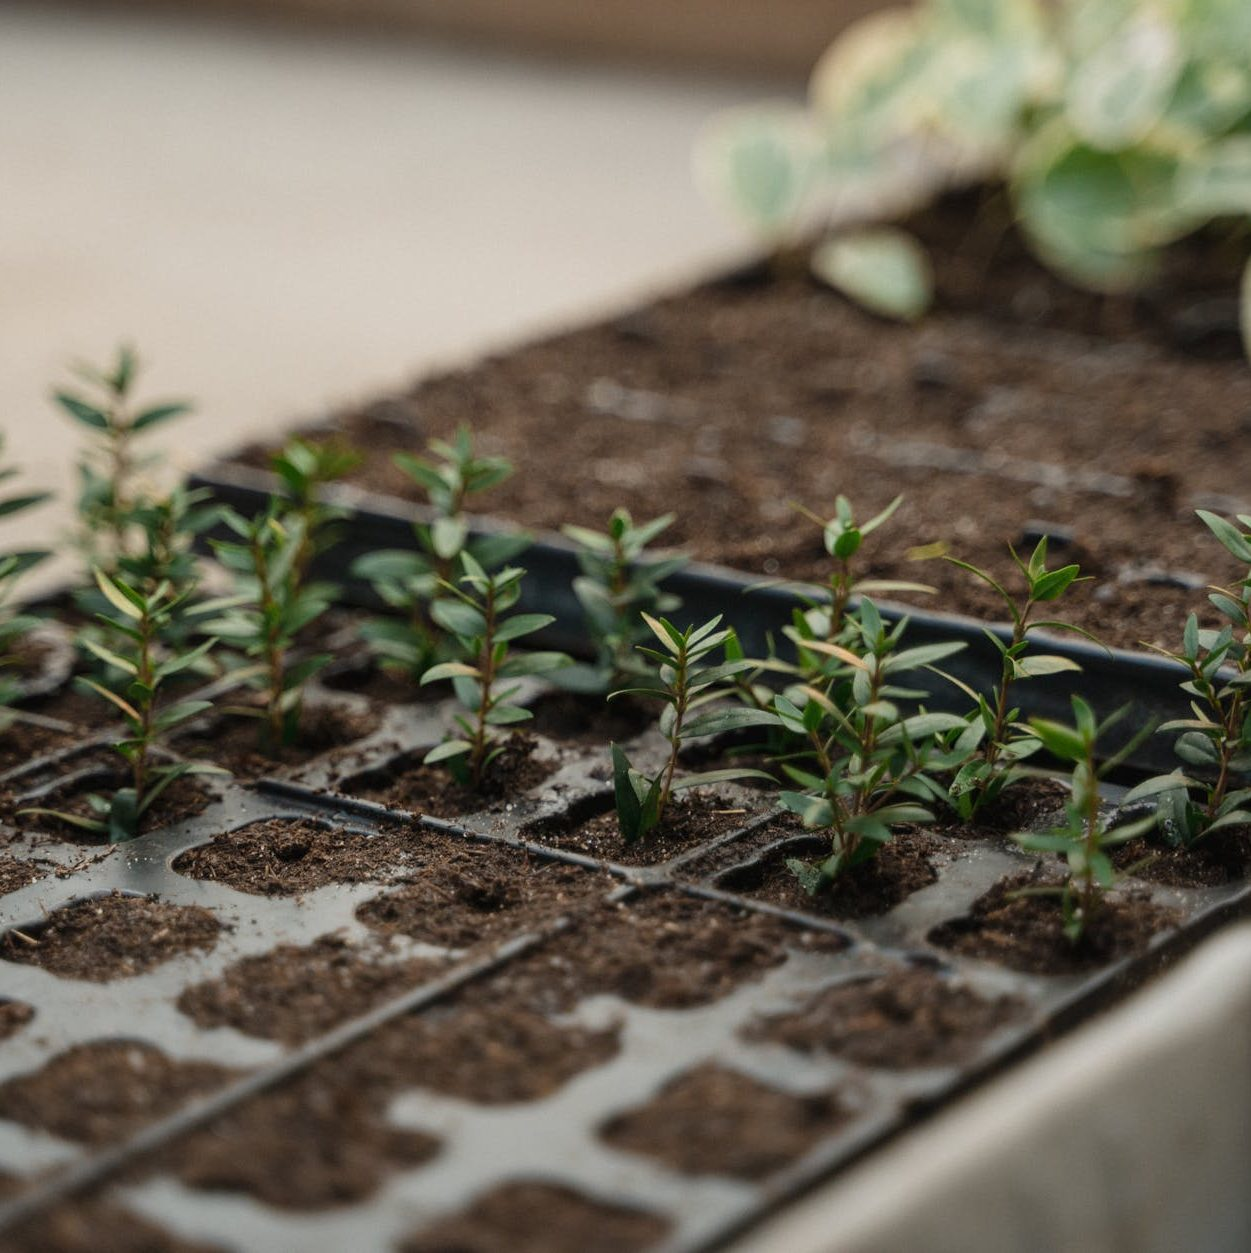 green plants on brown soil